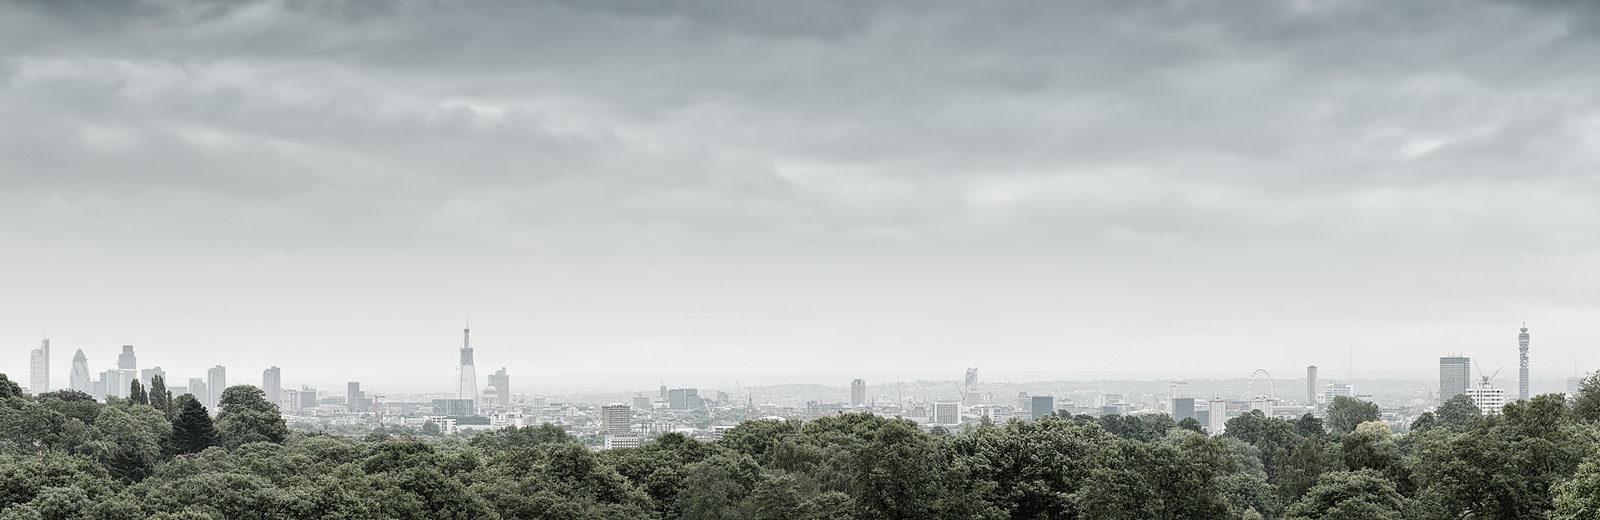 Hampstead Heath View 2010 - Hi-Res London Panoramic Photo Print